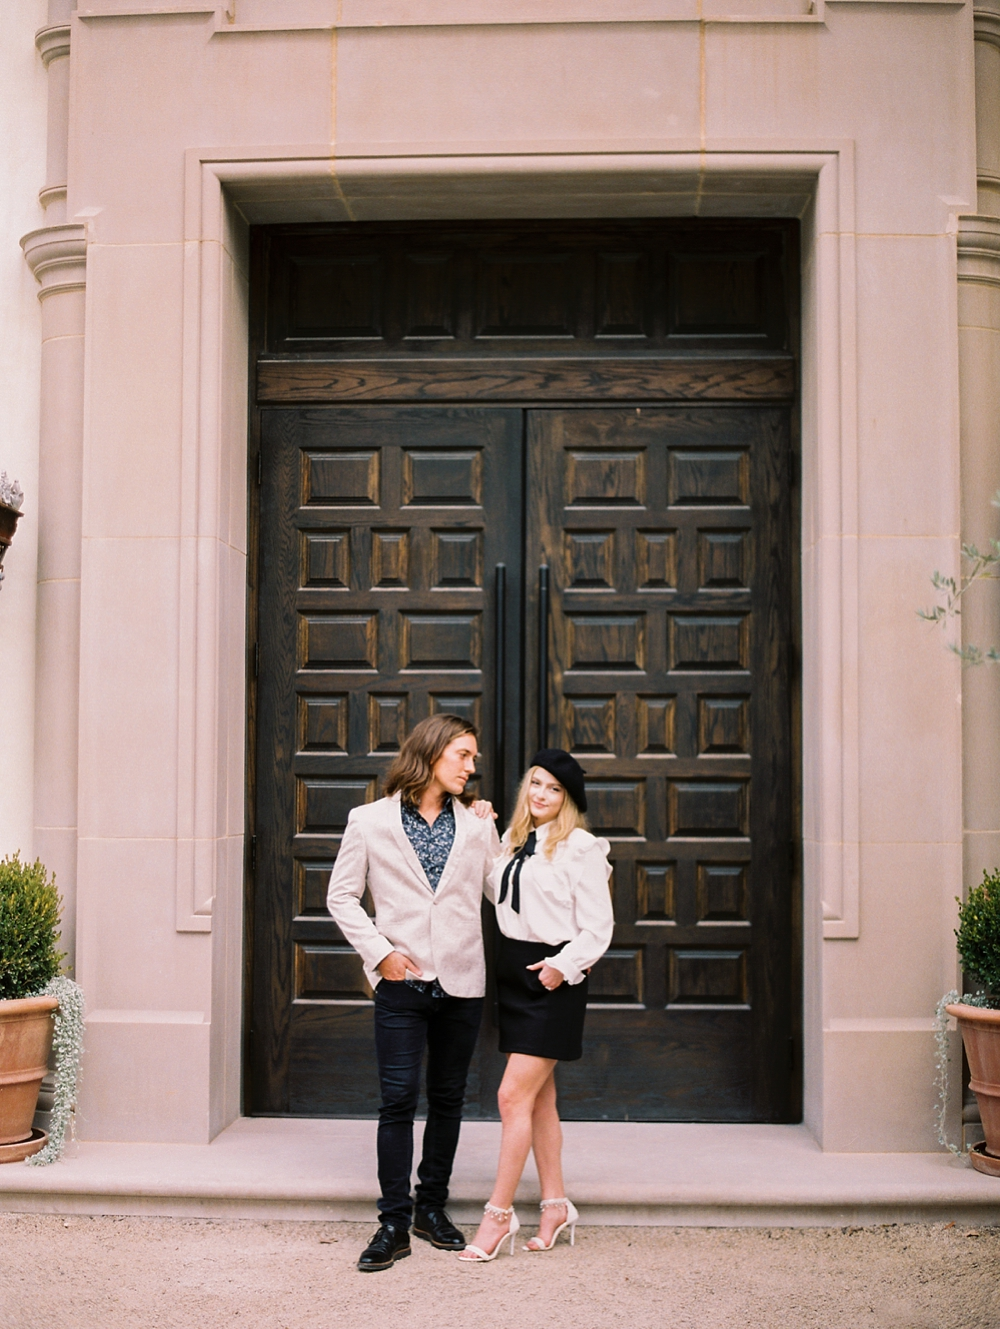 kristin-la-voie-photography-Austin-Wedding-Boudoir-Photographer-Commodore-Perry-Estate-29